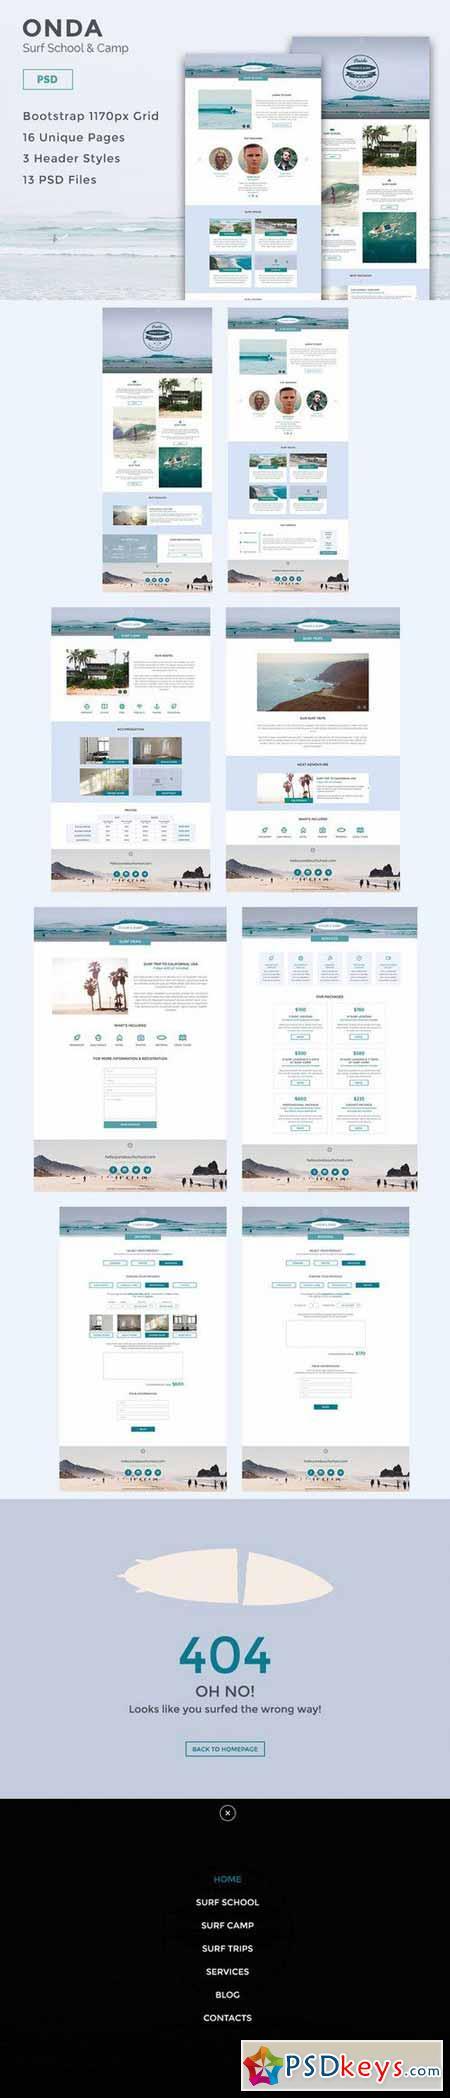 Onda - Surf School PSD Template 582832